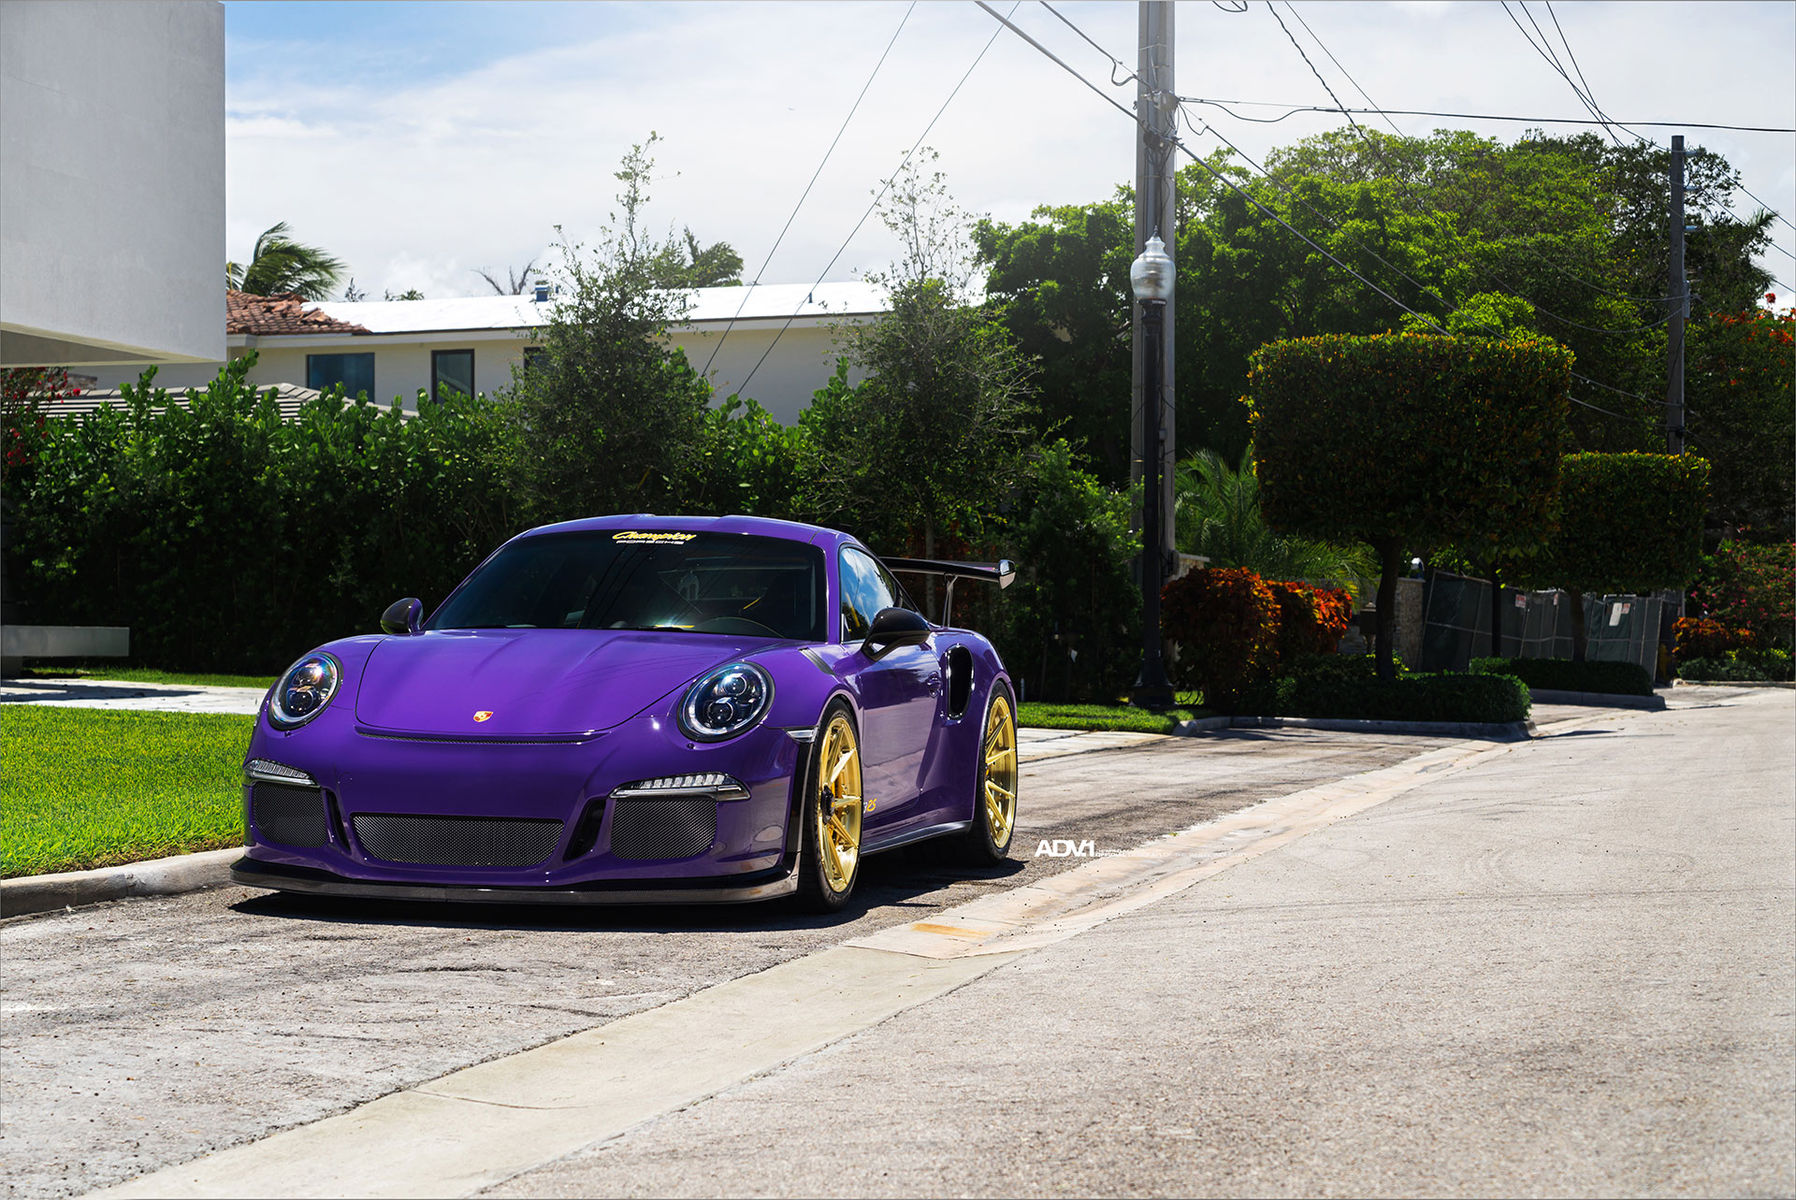 2017 Porsche 911 | ADV.1 Advanced Series | Purple Porsche GT3 RS